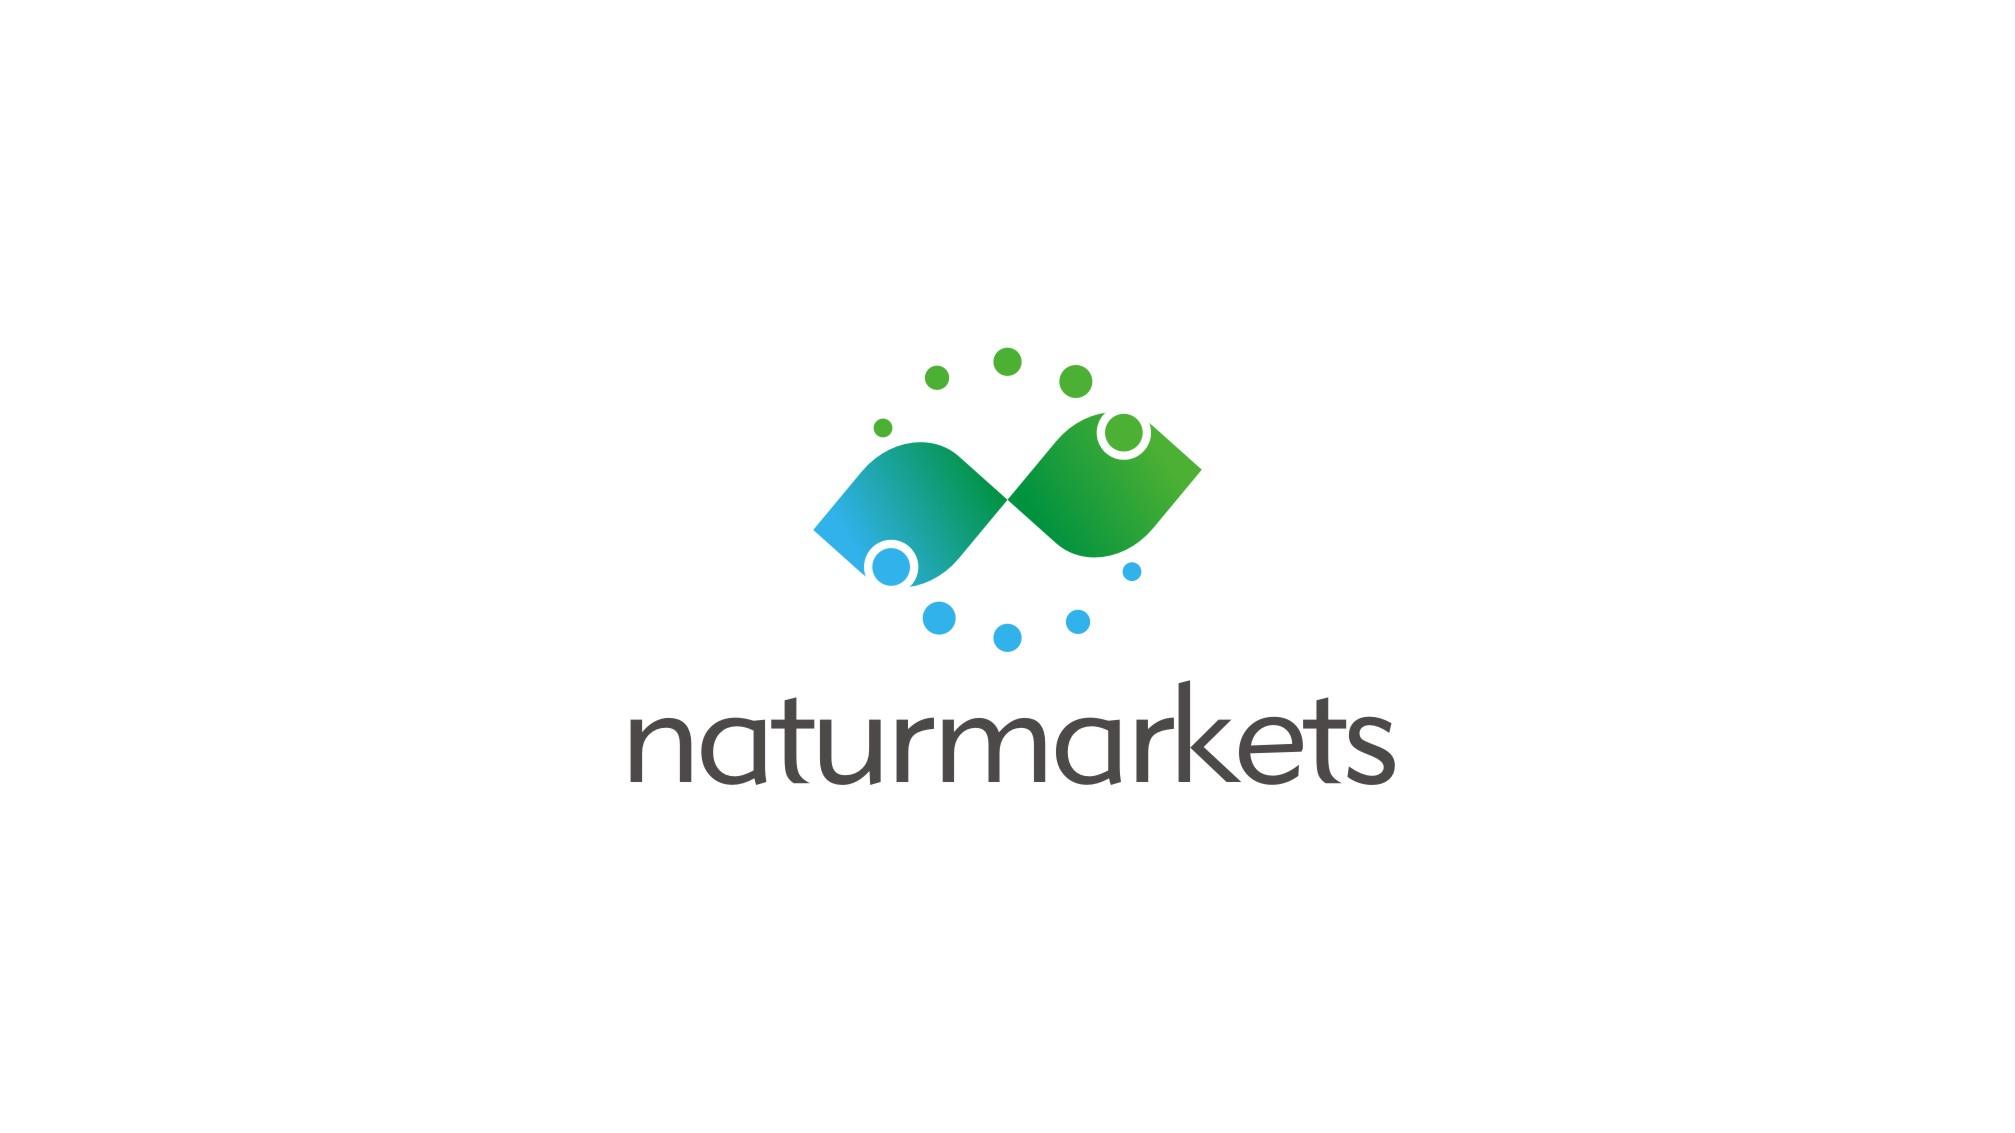 naturmarkets品牌LOGO设计